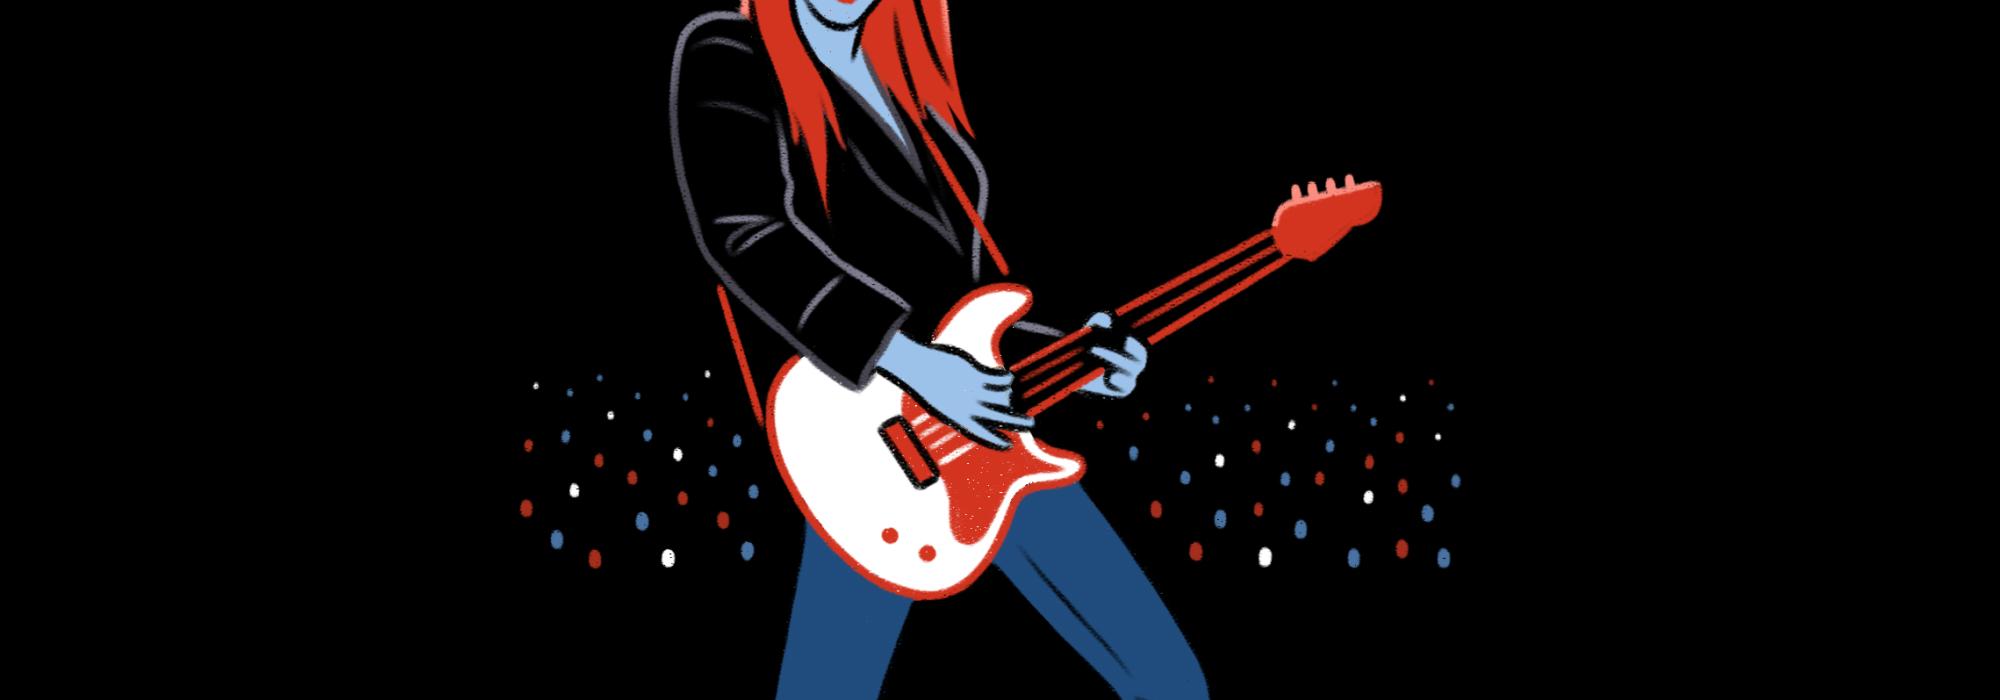 A Cult Of Luna live event